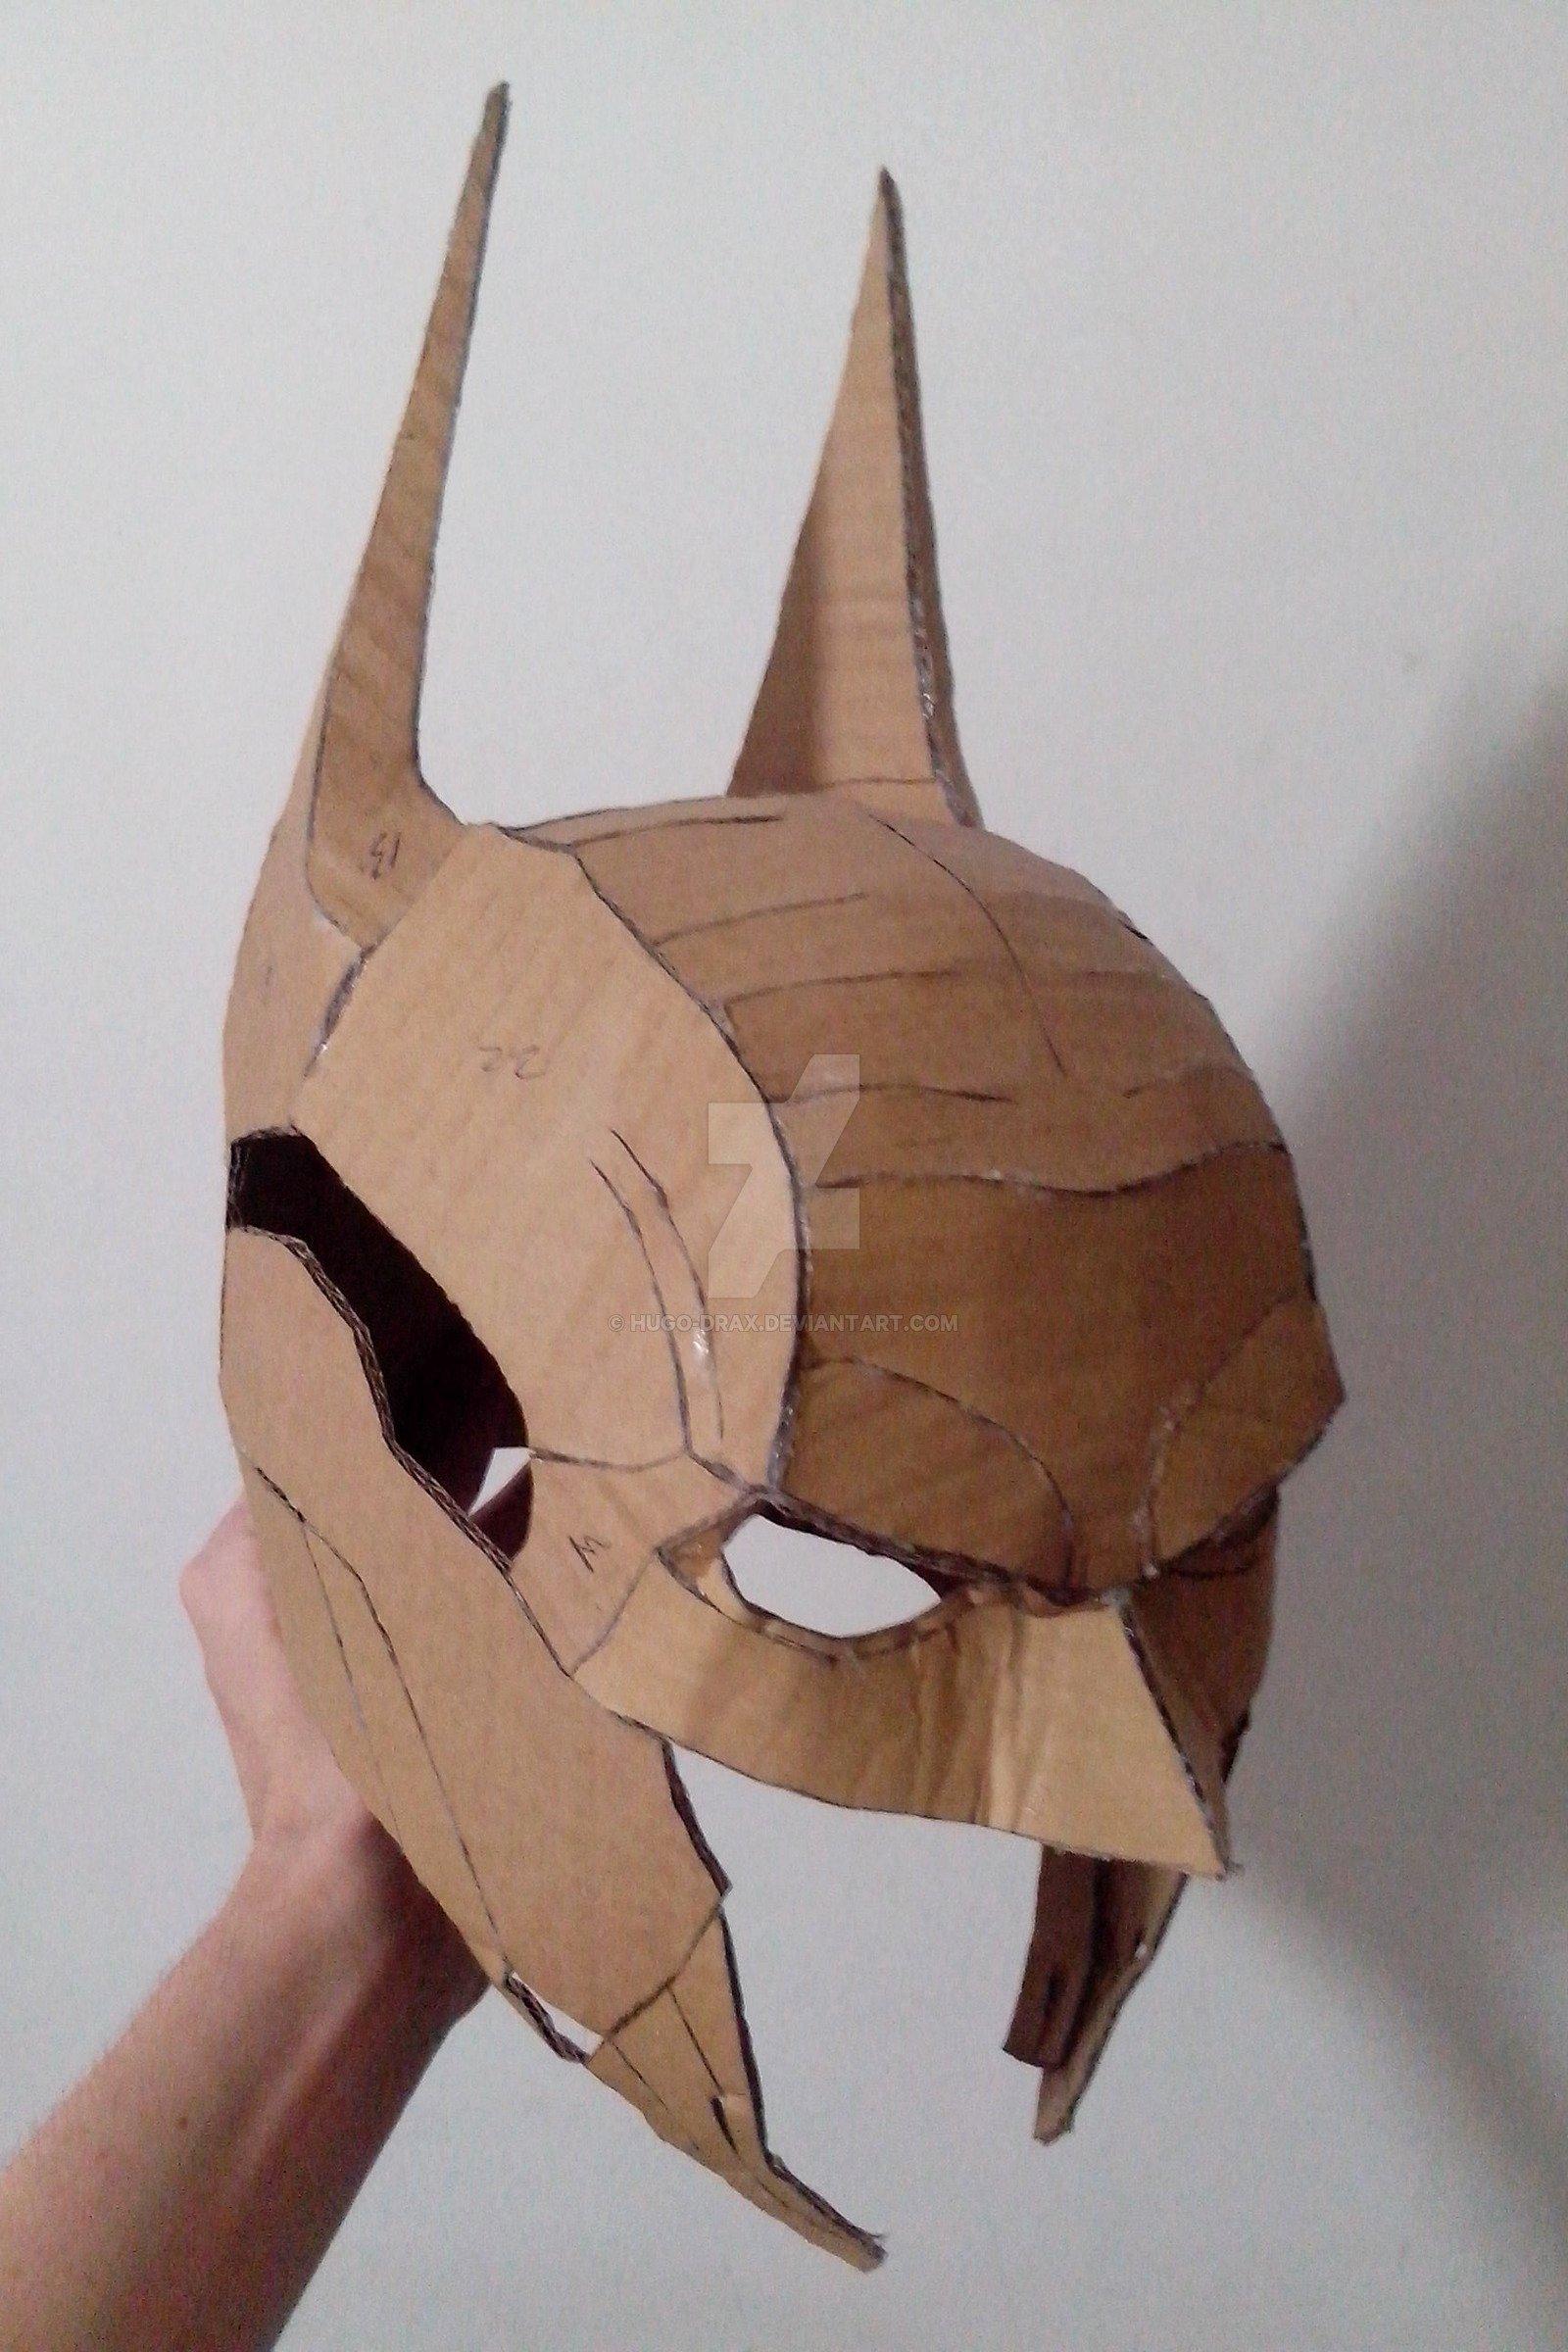 Cardboard Knight Helmet Template Awesome Arkham Knight Papercraft Helmet by Hugo Drax On Deviantart